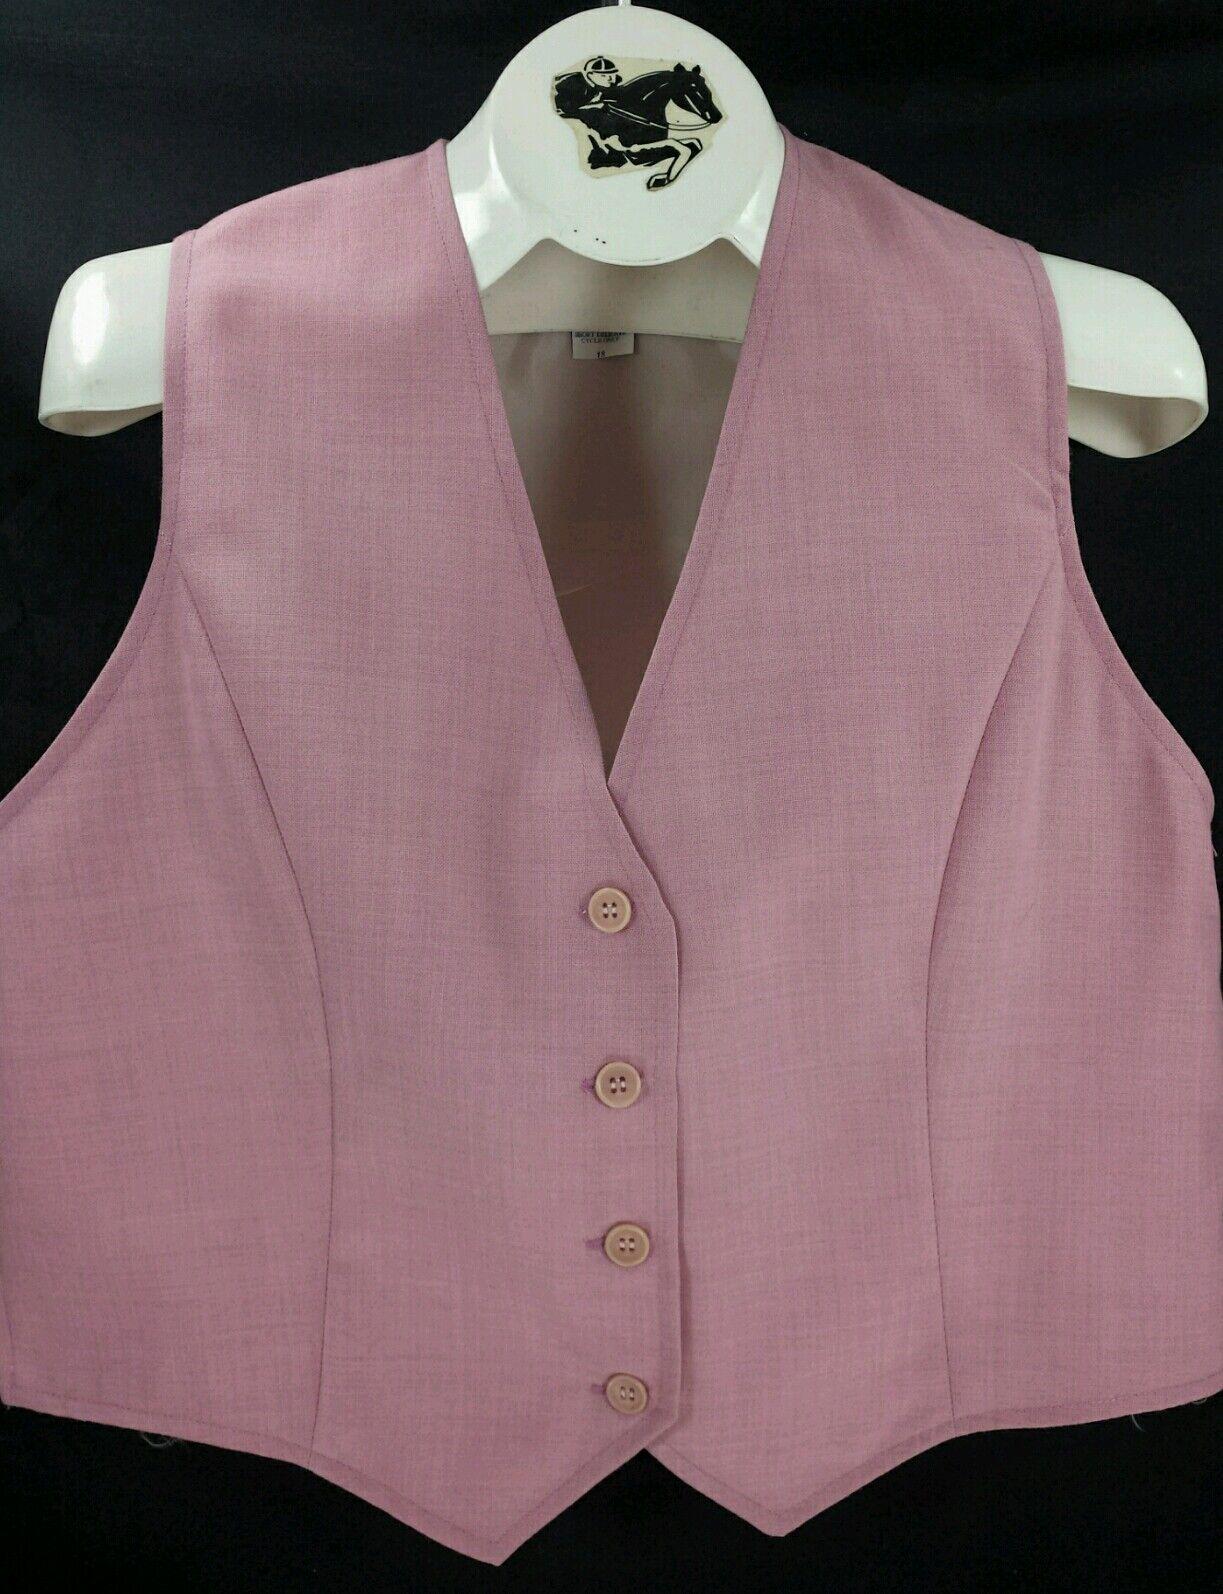 Reed Hill Ladies Saddleseat Vest PINK pink Polyester Blend - USA